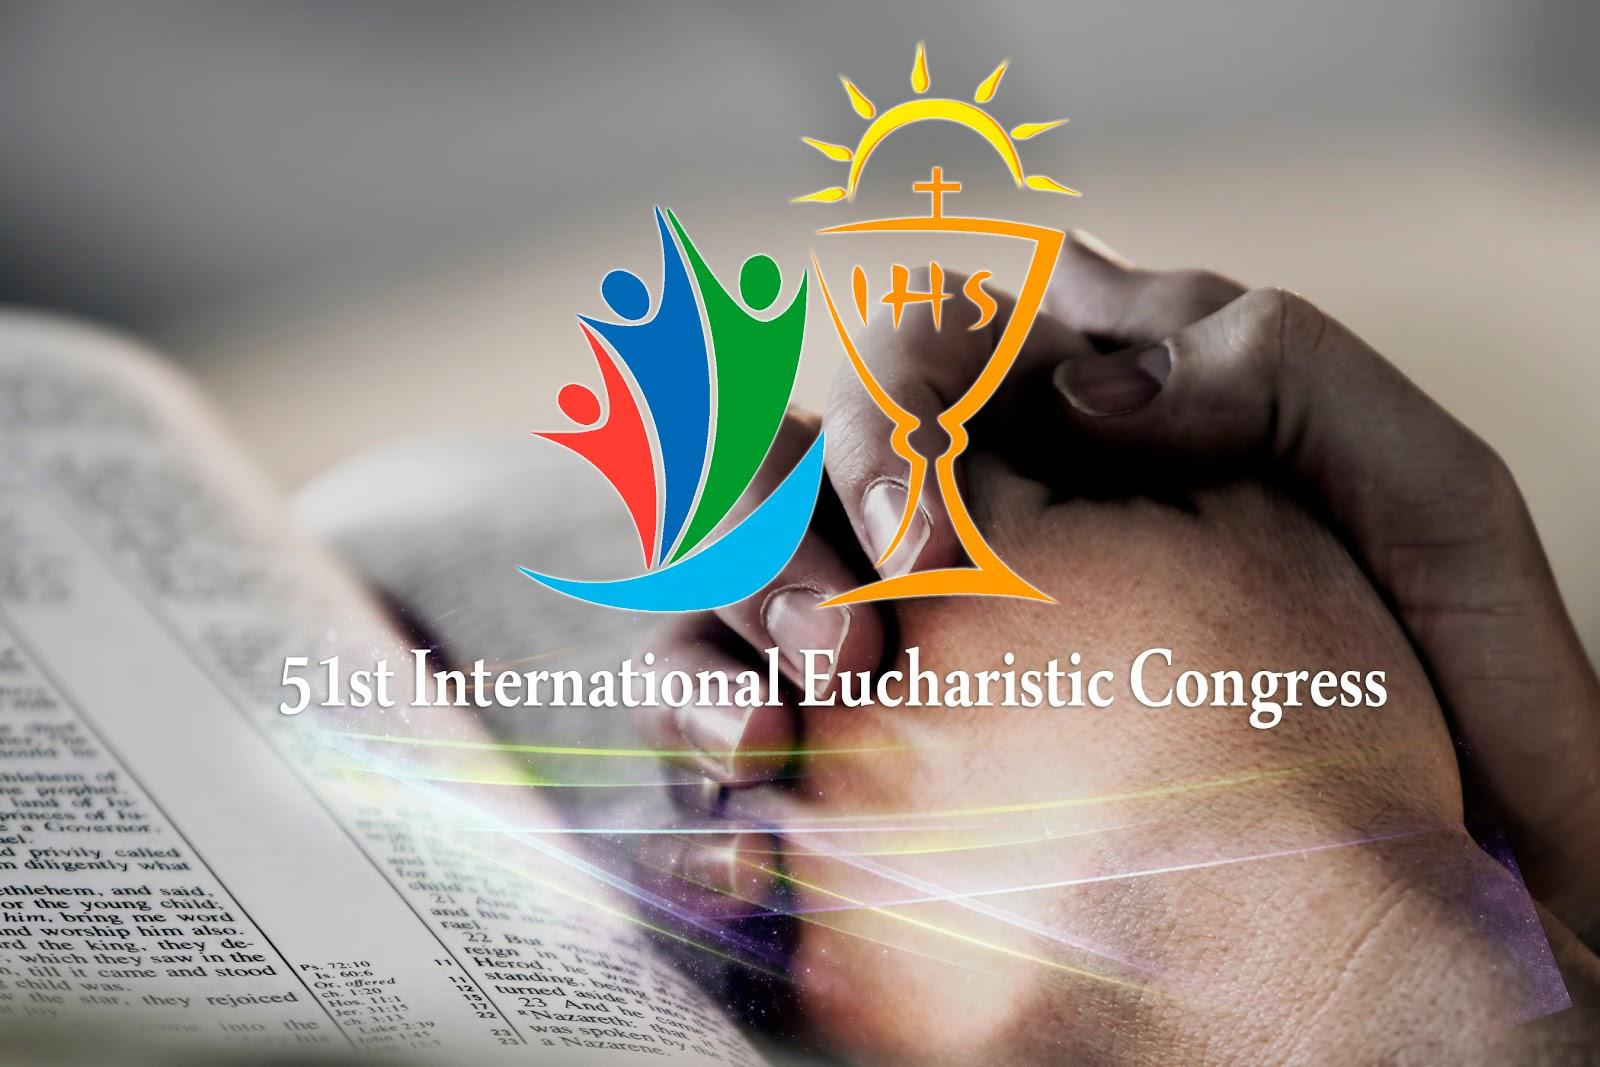 Praying hands with IEC logo